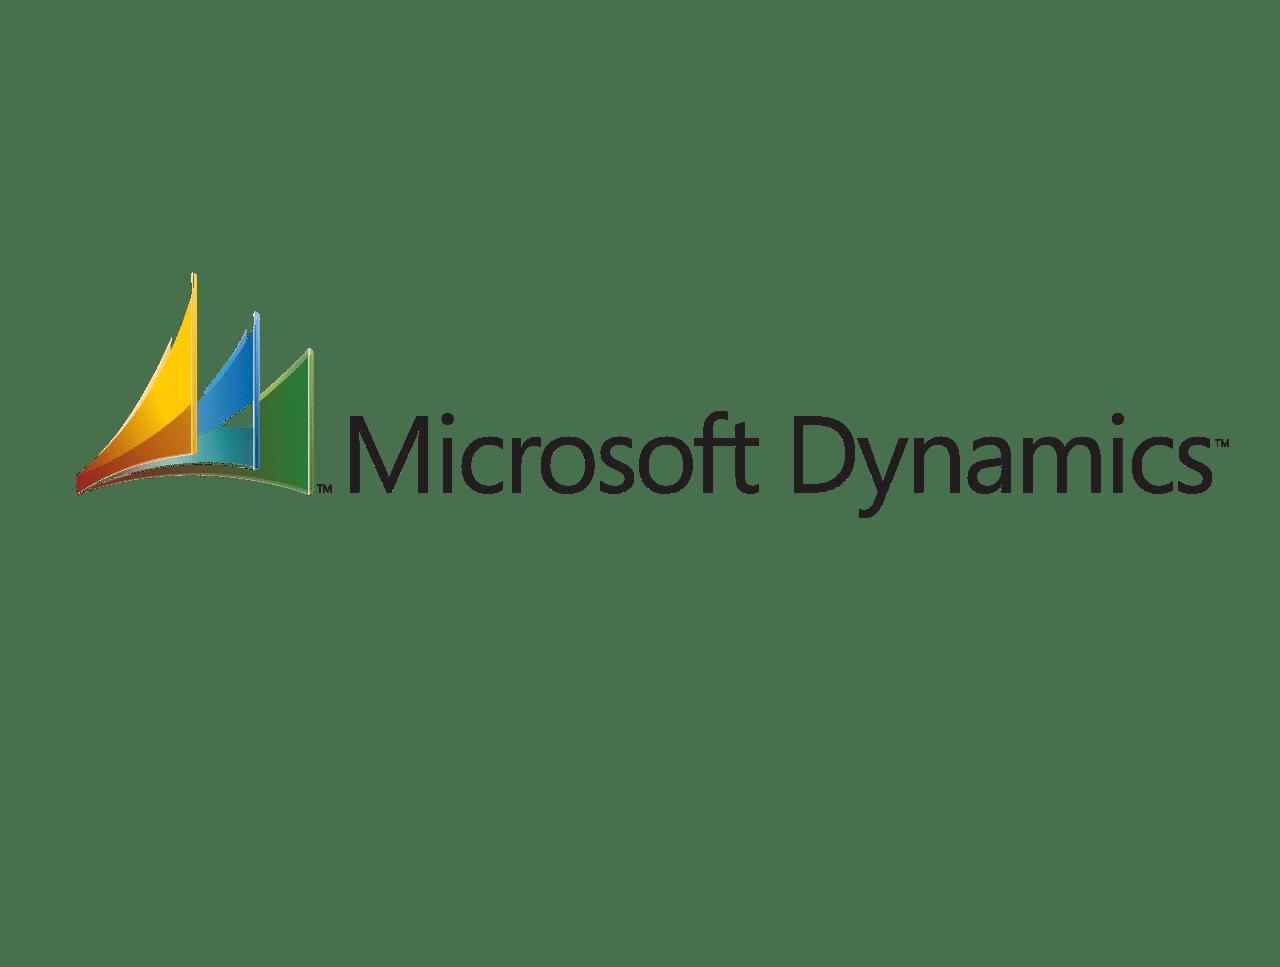 Microsoft_Dynamics_Logo